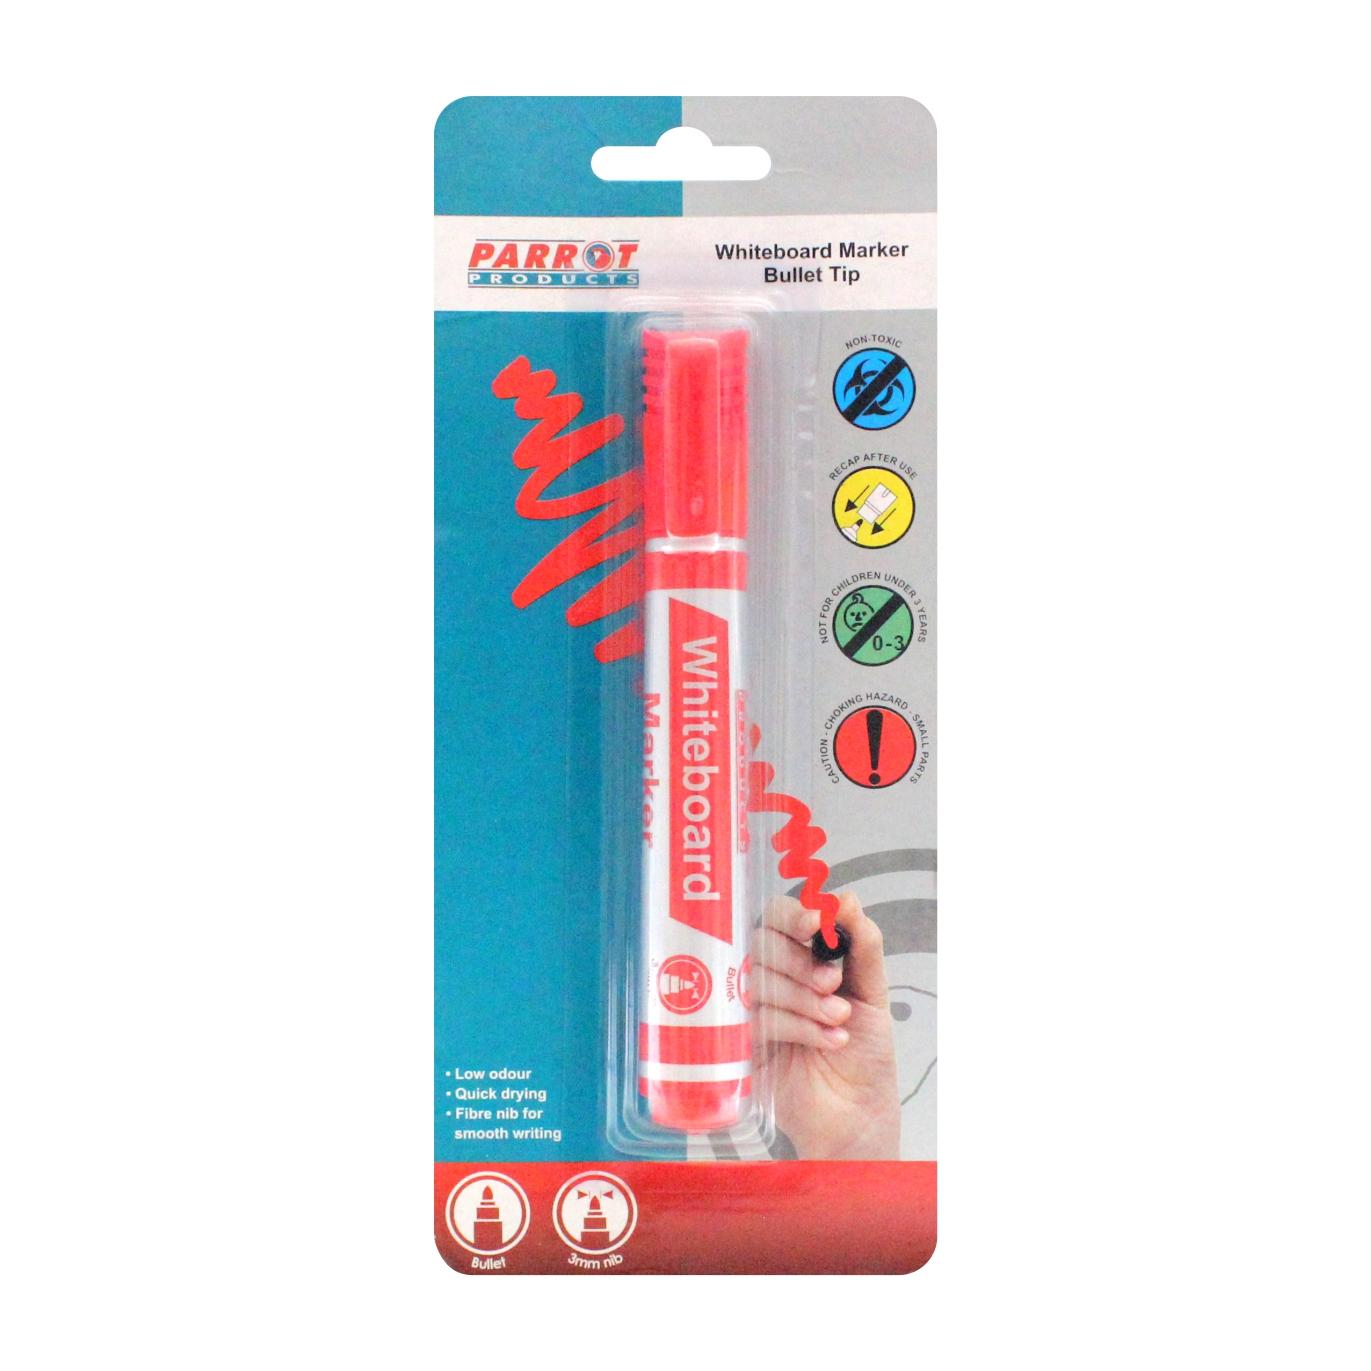 Whiteboard Marker (Bullet Tip, Carded, Red)